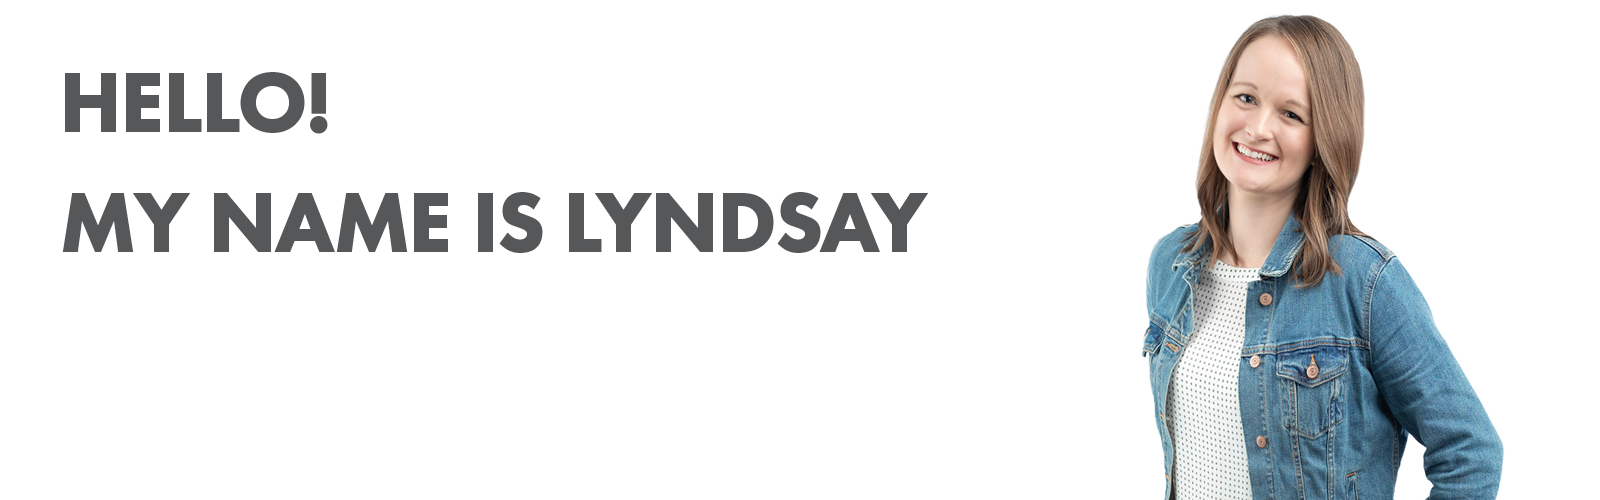 lyndsay | designer at fbc remodel